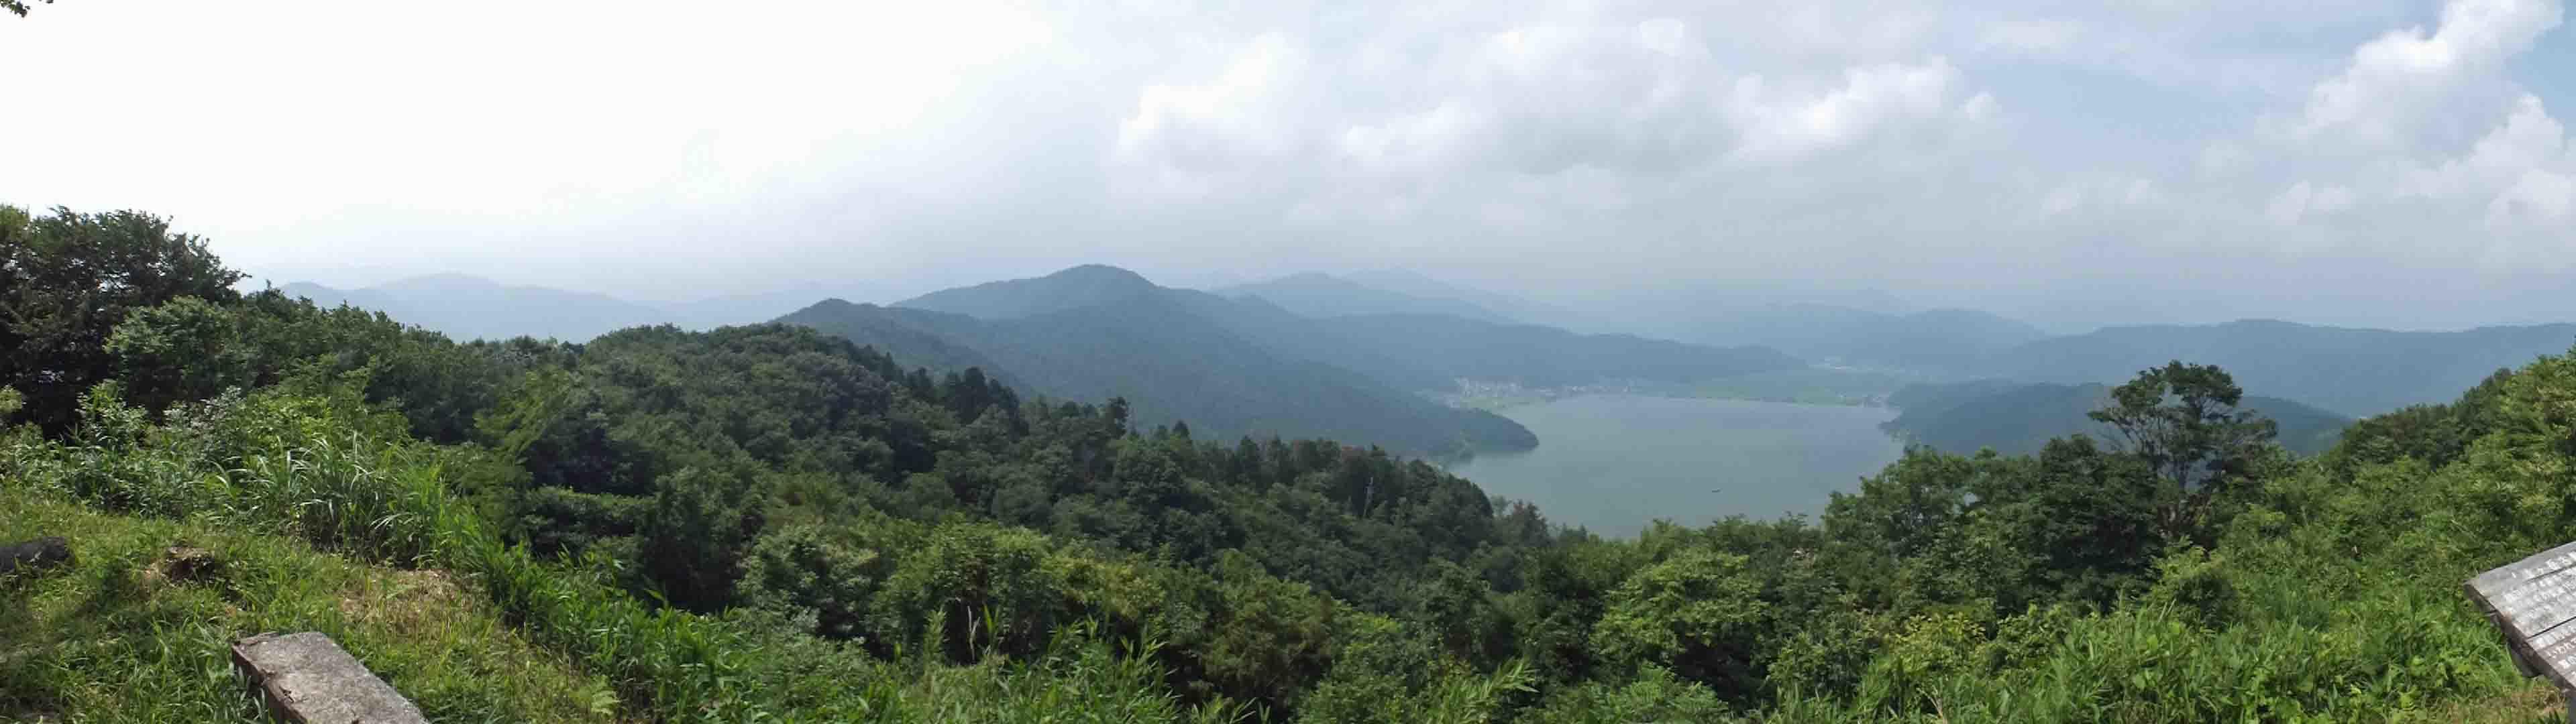 DSCF3197山頂から余湖